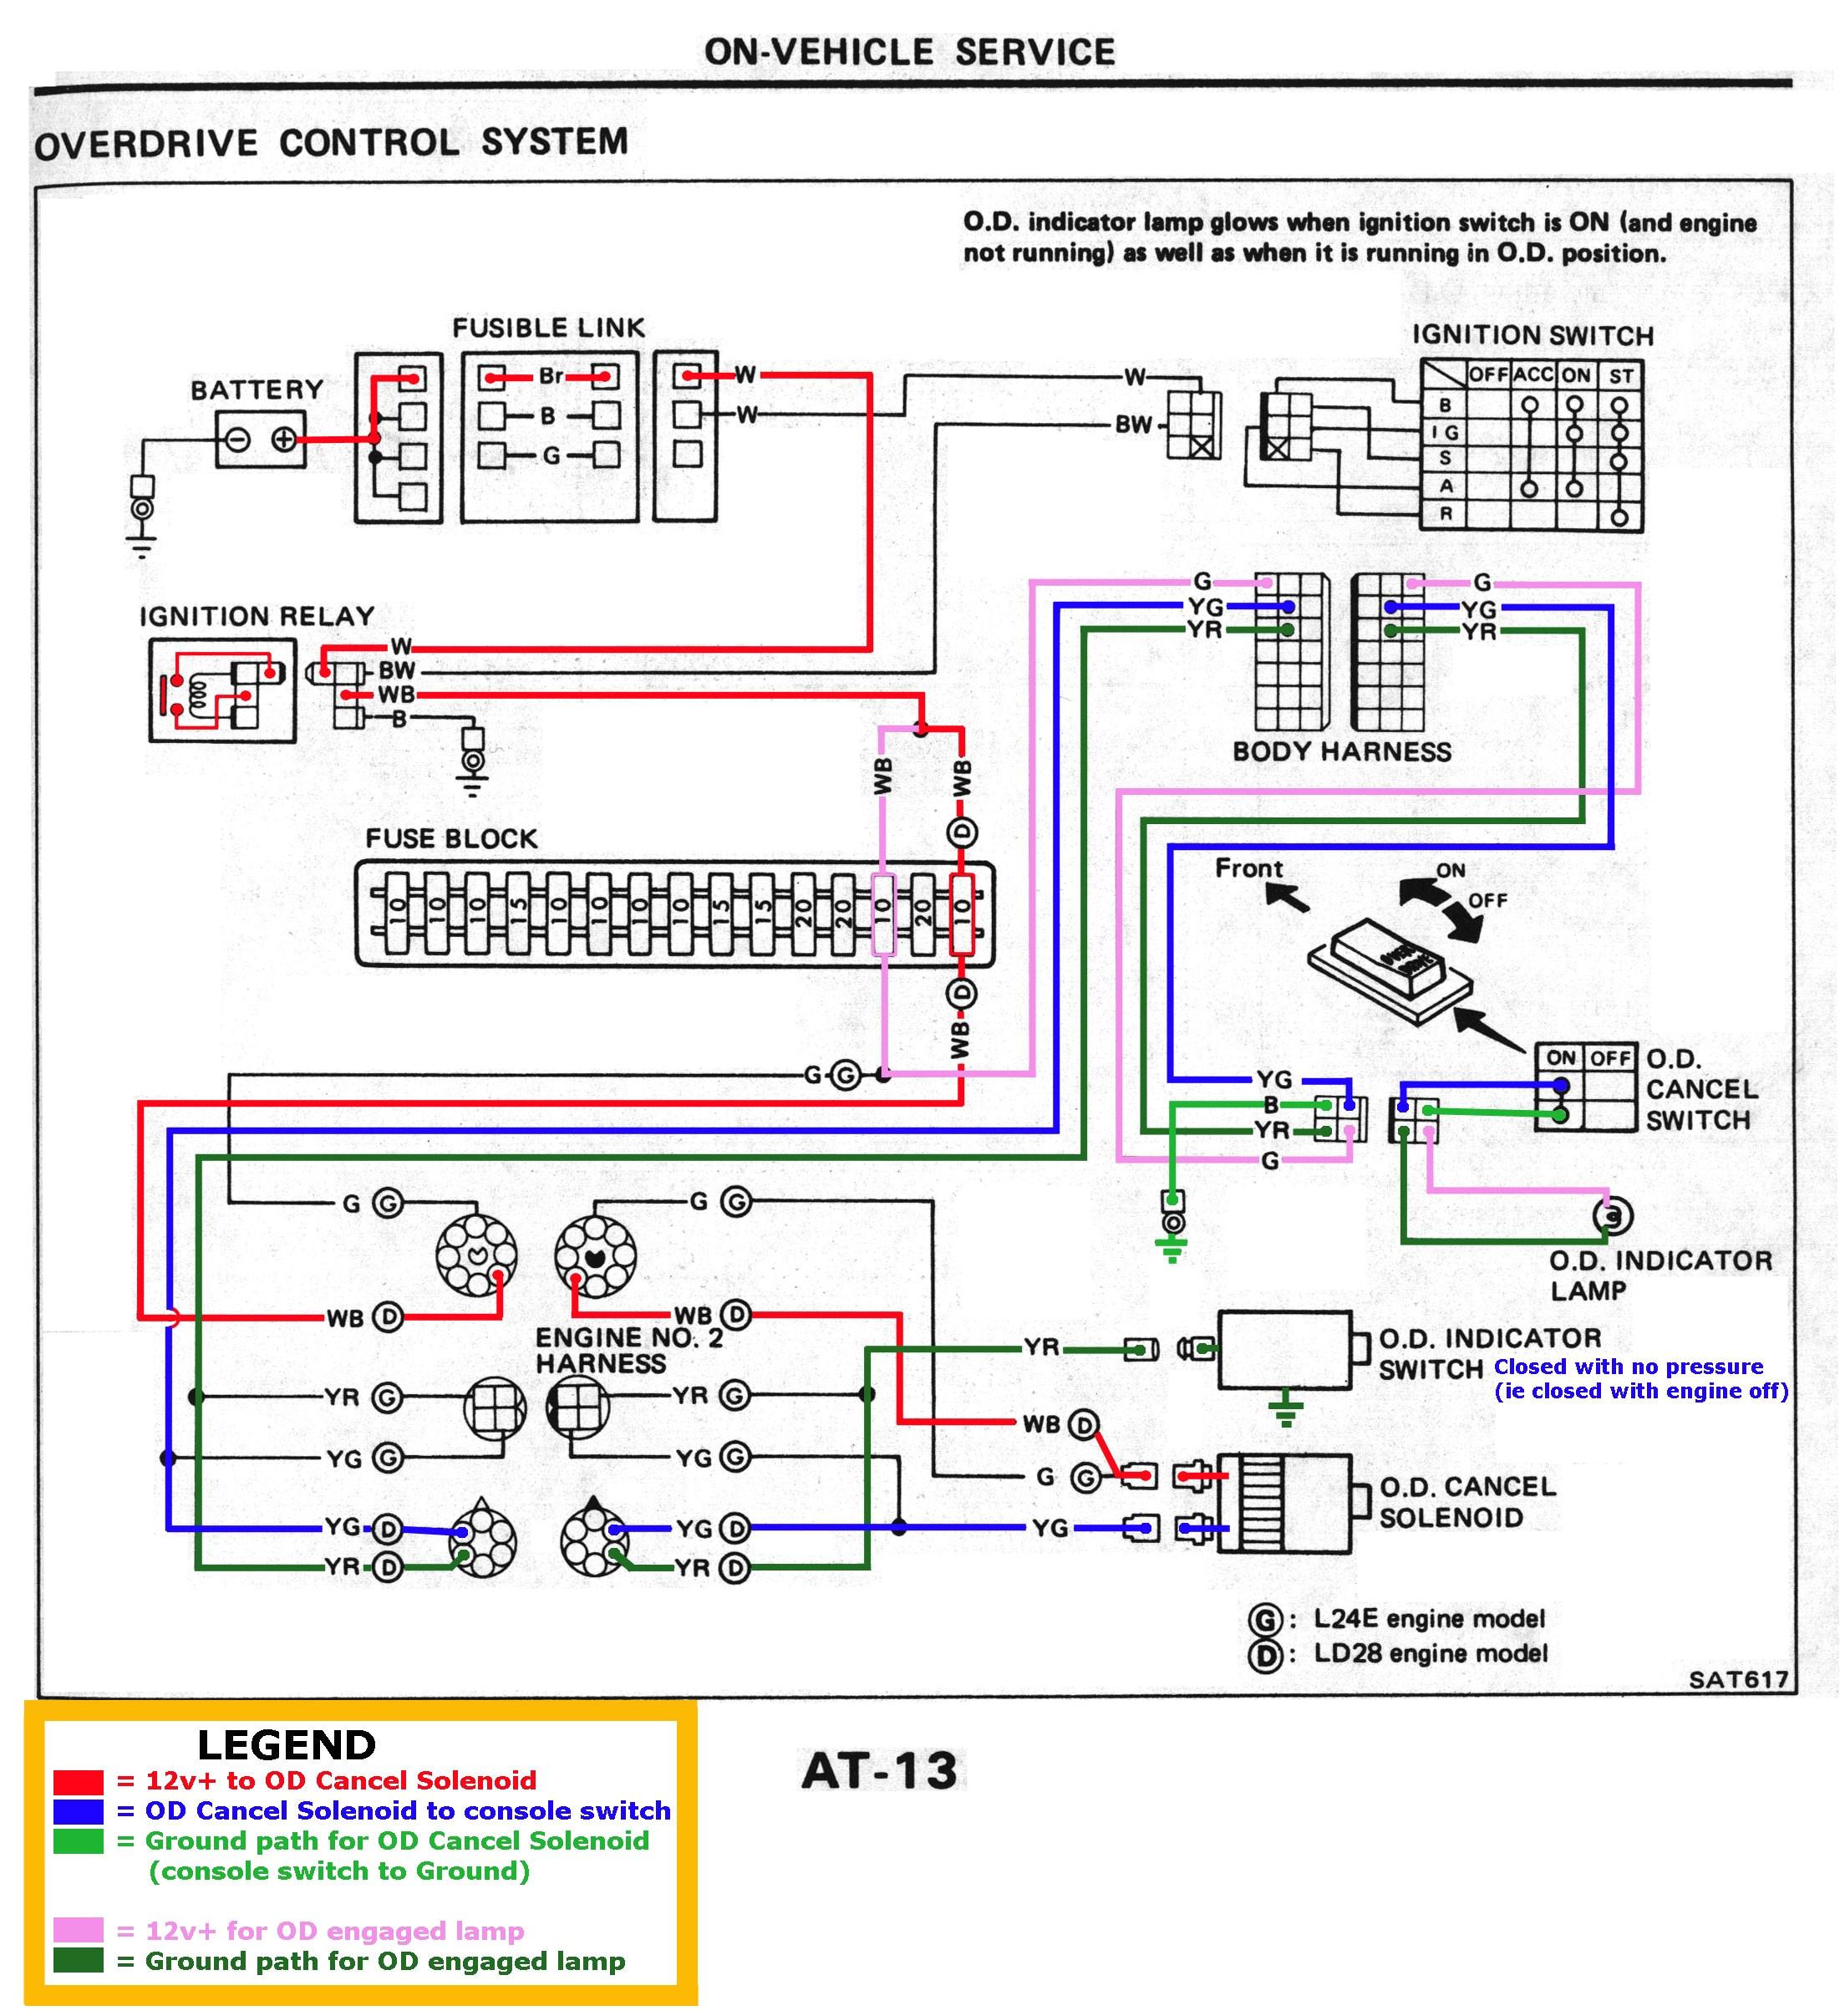 2004 Yamaha R1 Wiring Diagram 1998 Co Wiring Diagram Schema Diagram Database